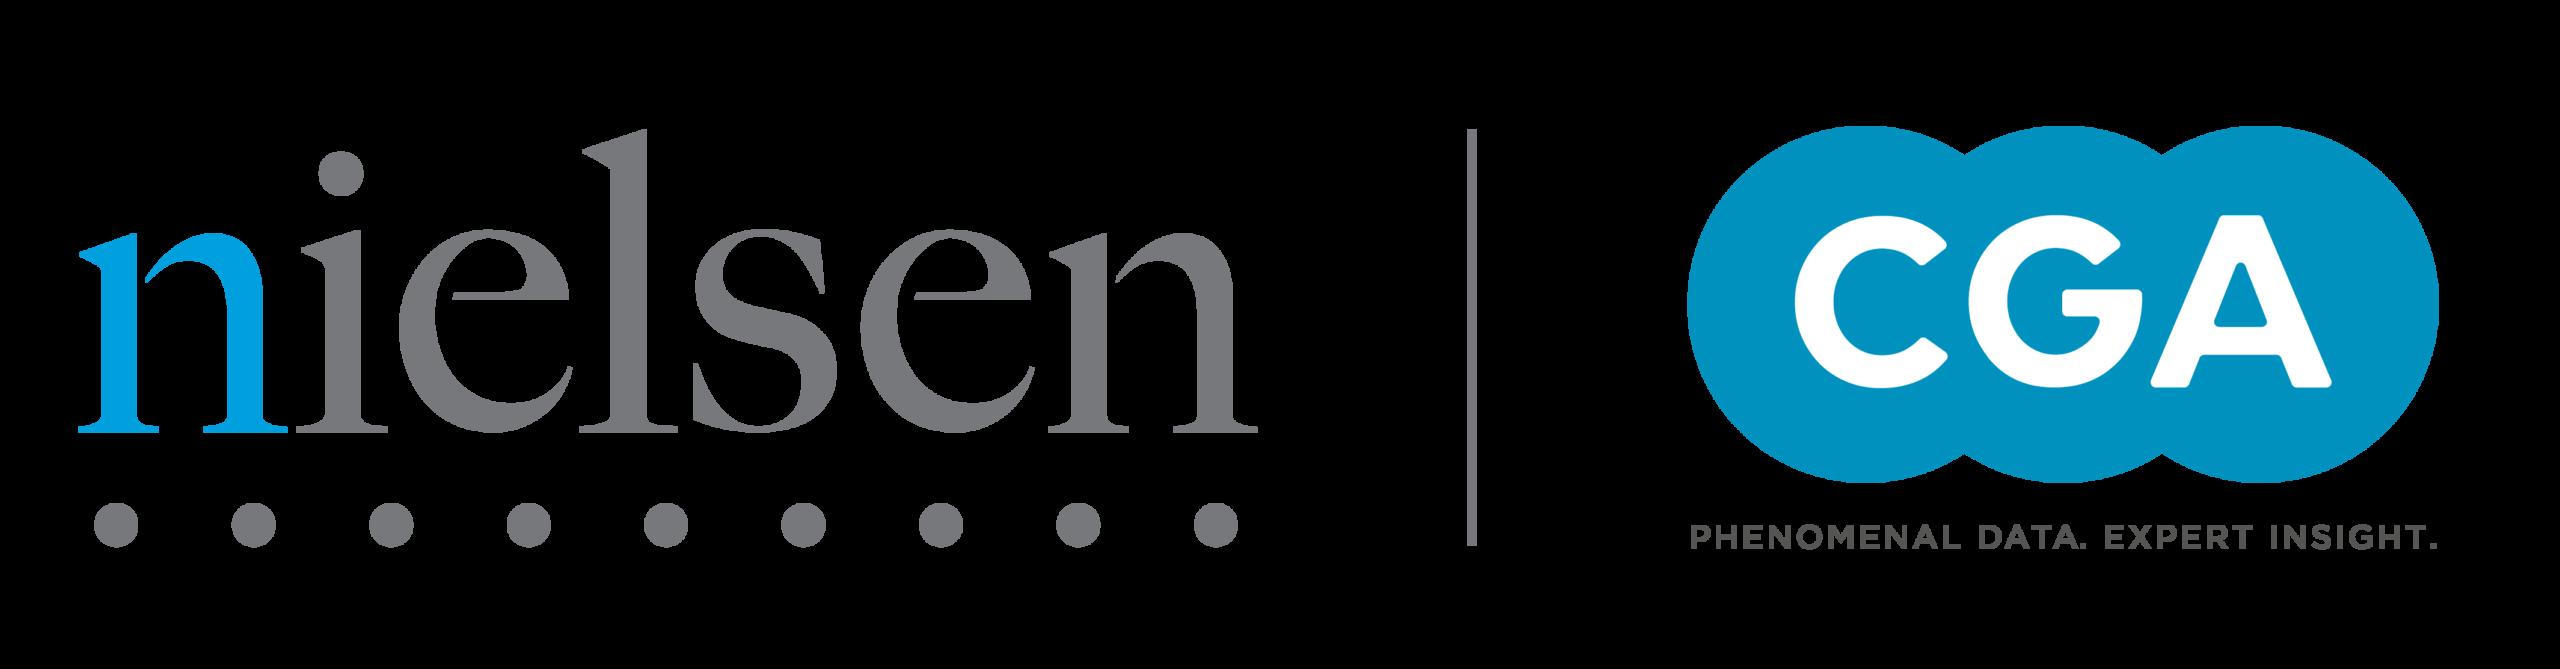 CGANielsen Logo